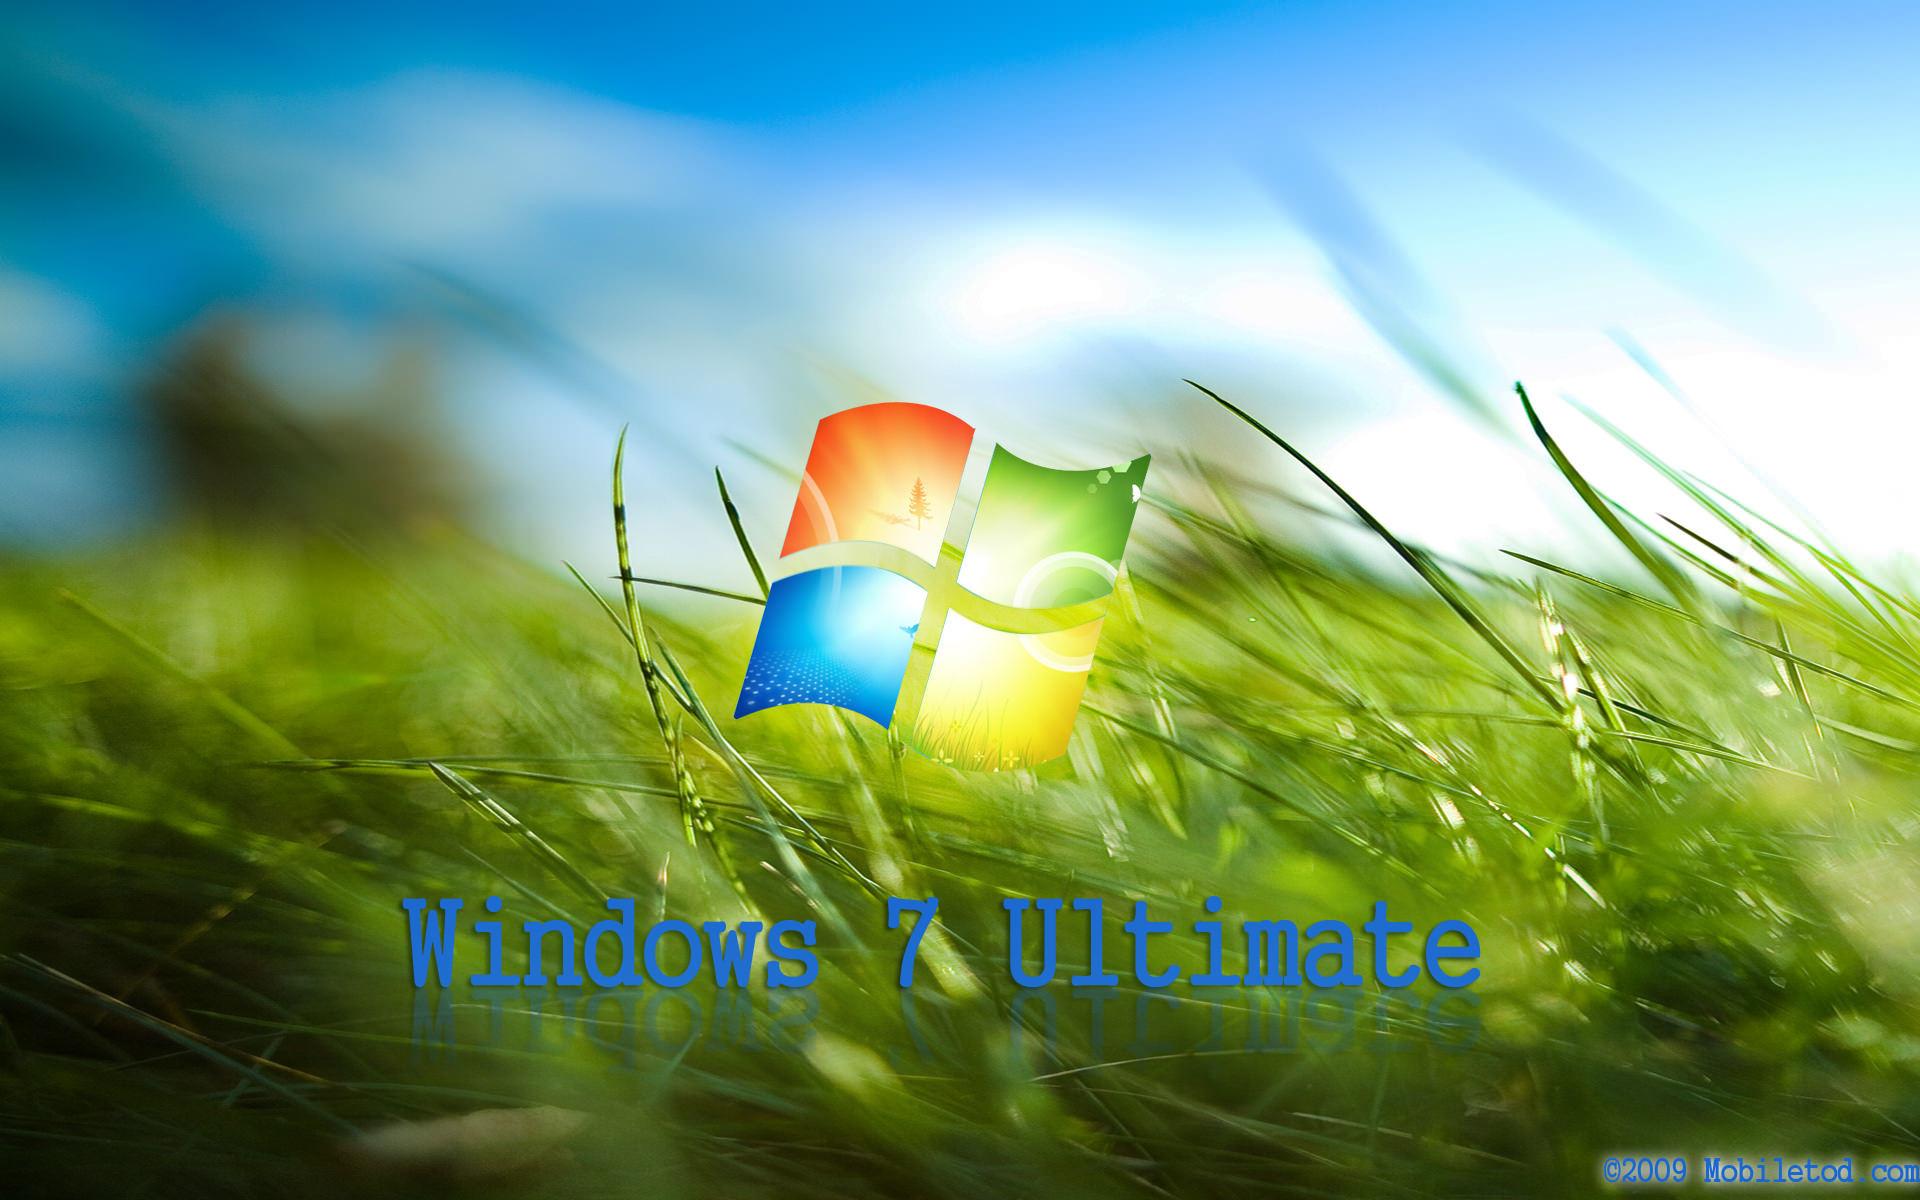 Windows 7 Whacked Wallpaper: Desktop Wallpaper For Windows 7 (67+ Images